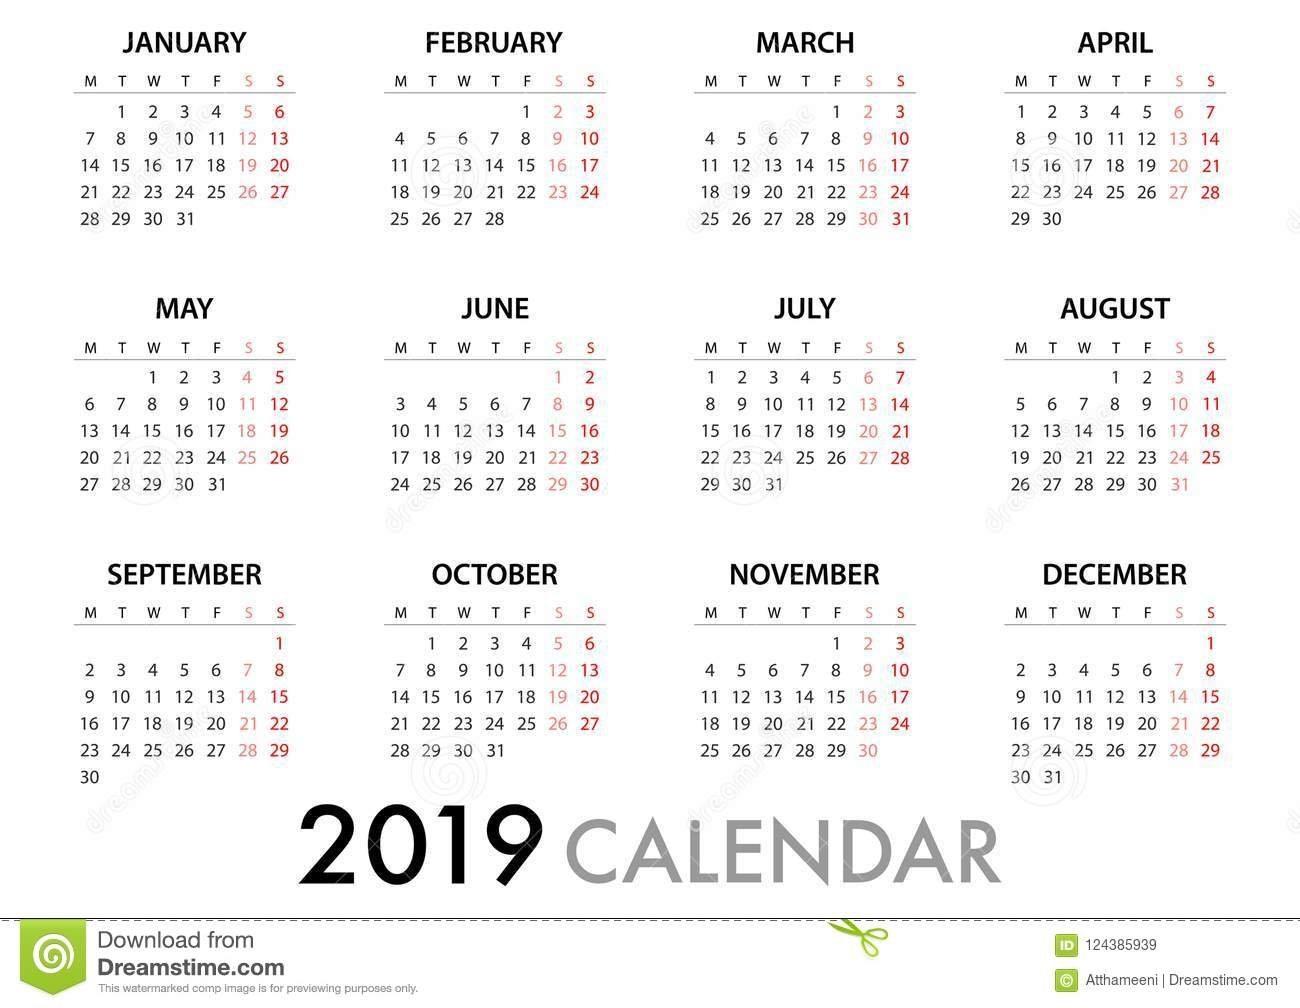 Calendar For 2019 Week Starts Monday. Simple Vector Template Stock Calendar 2019 By Week